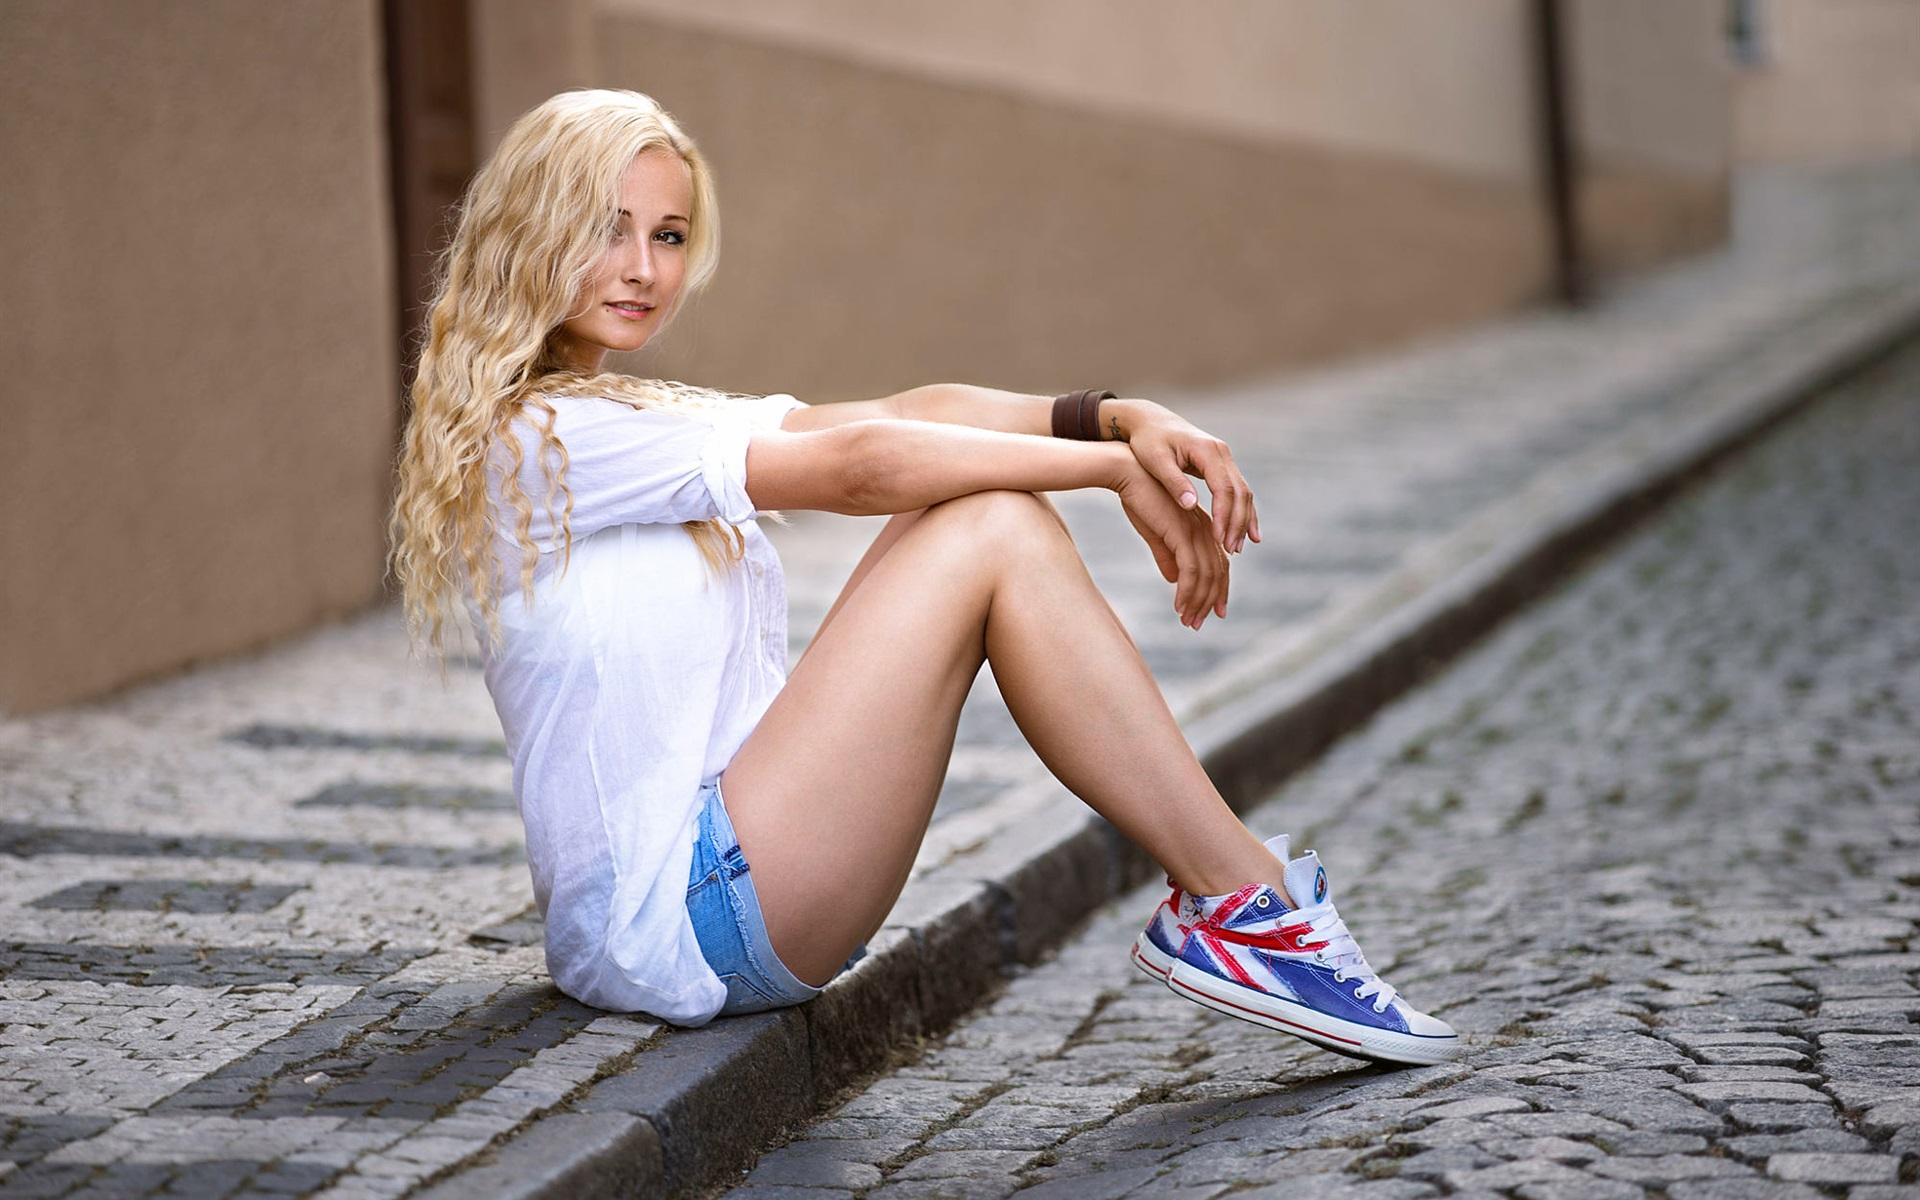 seks-suhoparie-blondinki-foto-lizhut